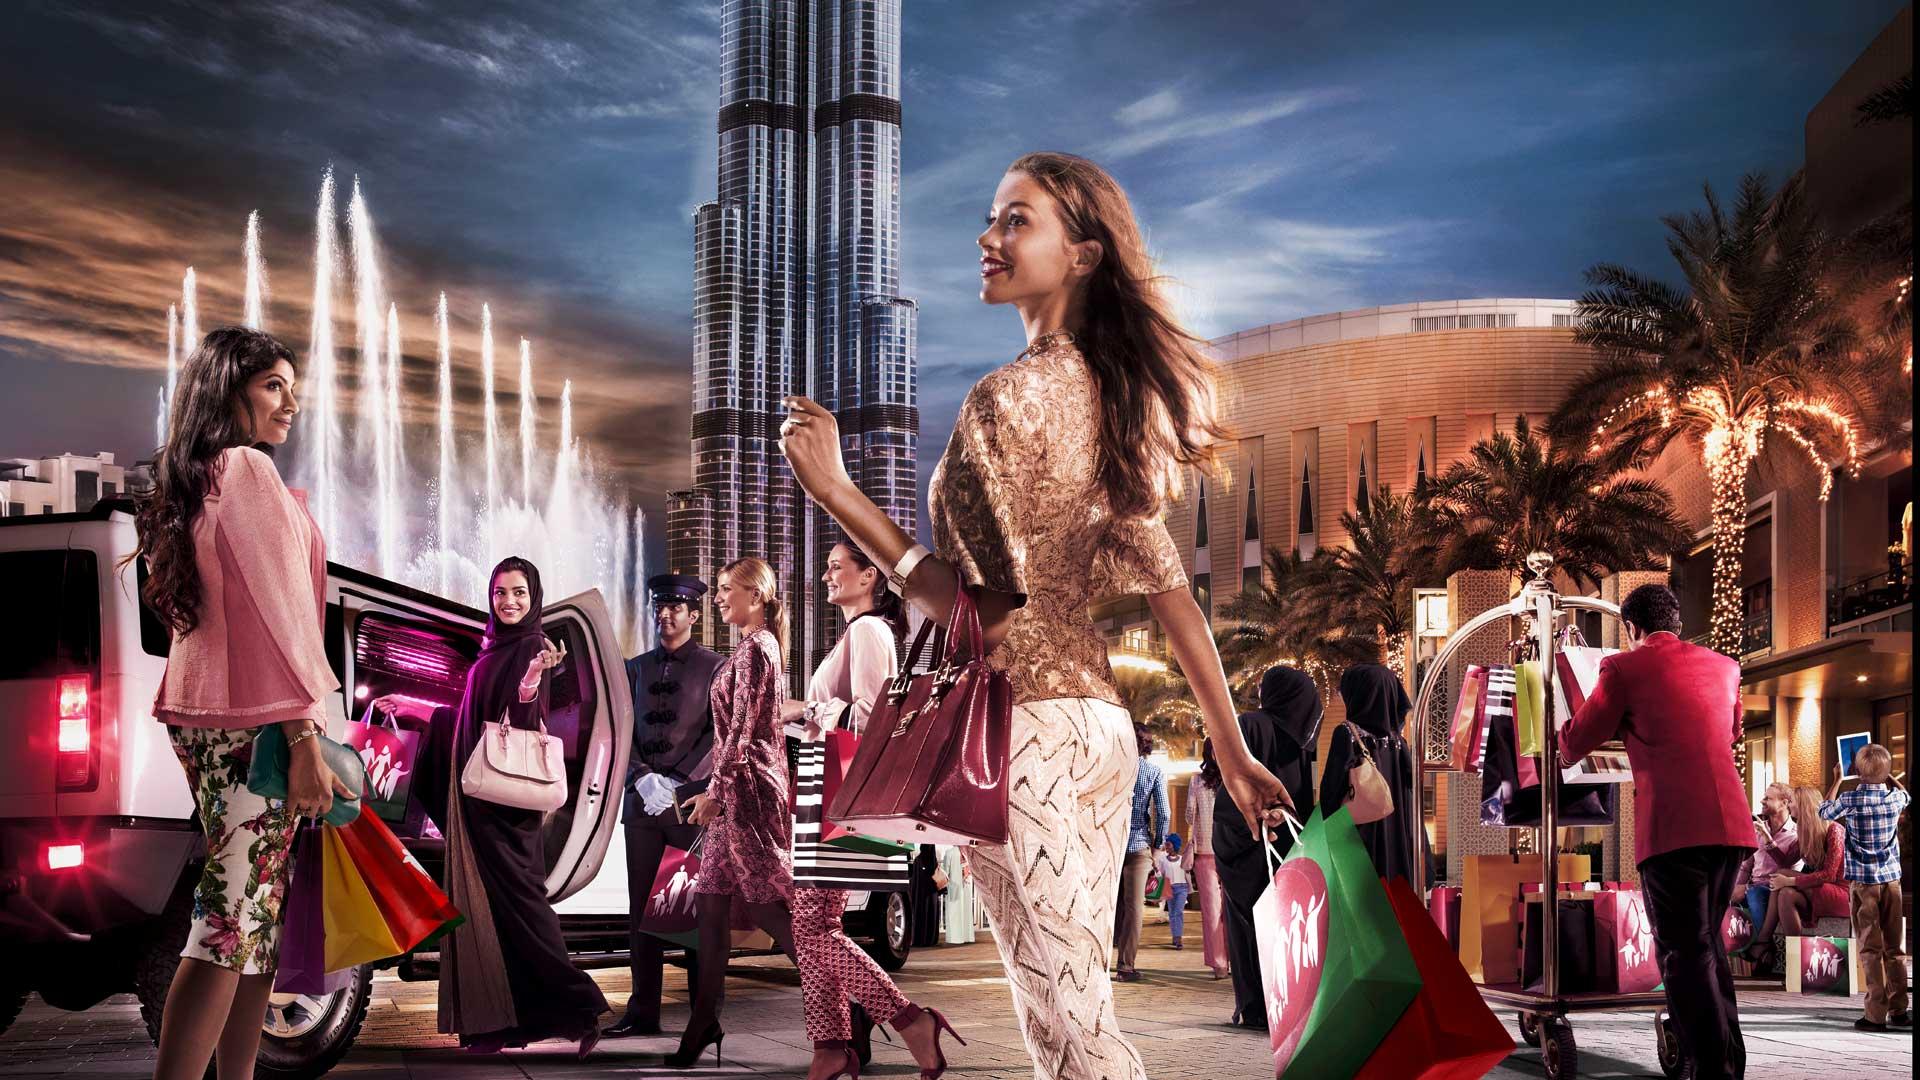 Eurovíkendy-Dubaj-shopping-festival